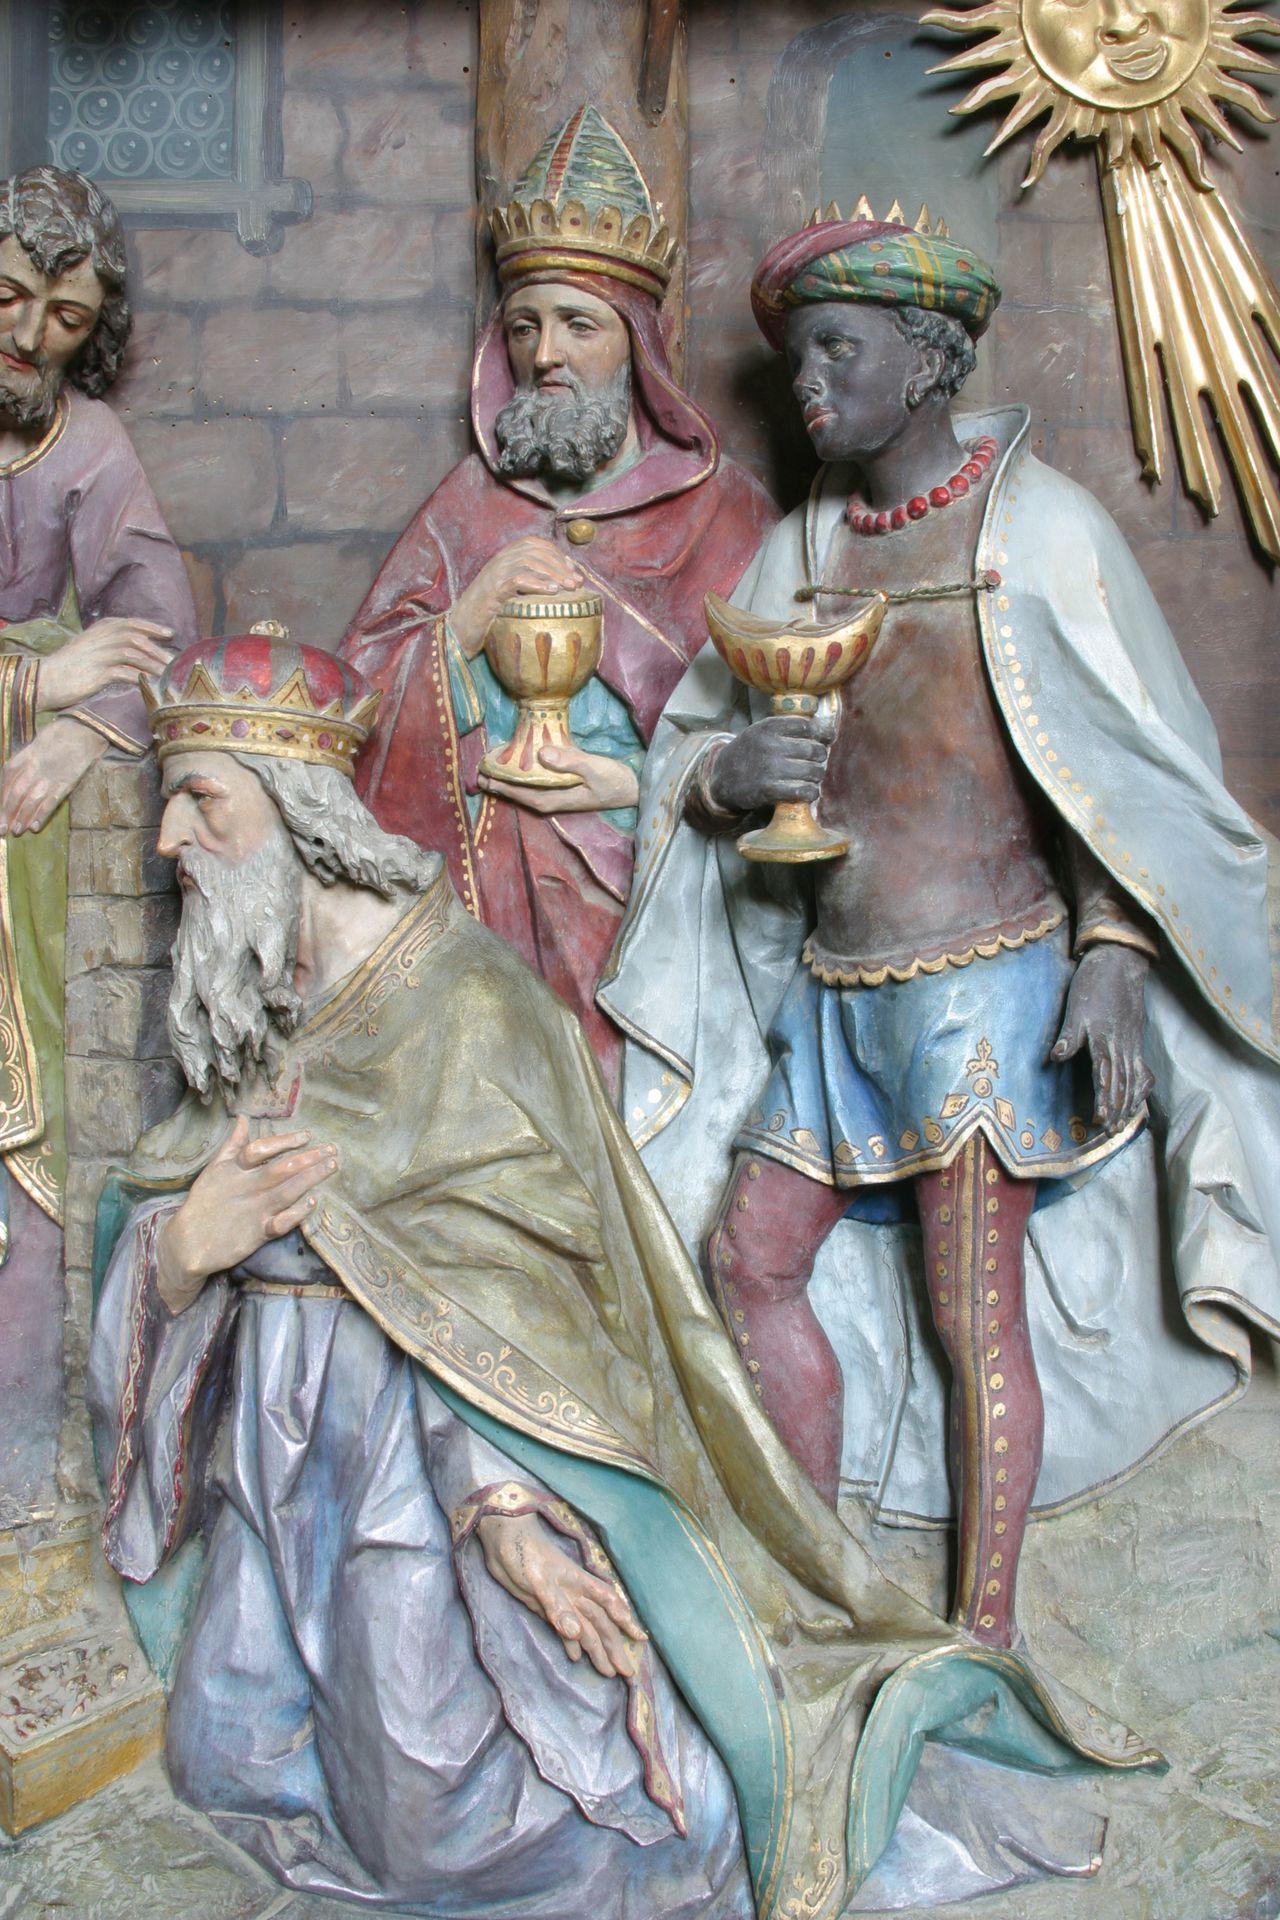 Biblical Magi Adoration Birth Christmas Creche Epiphany Faith God Holy Jesus Kings Magi Manger Men Nativity Peace Religion Religious  Saint Scene Spiritual Wise